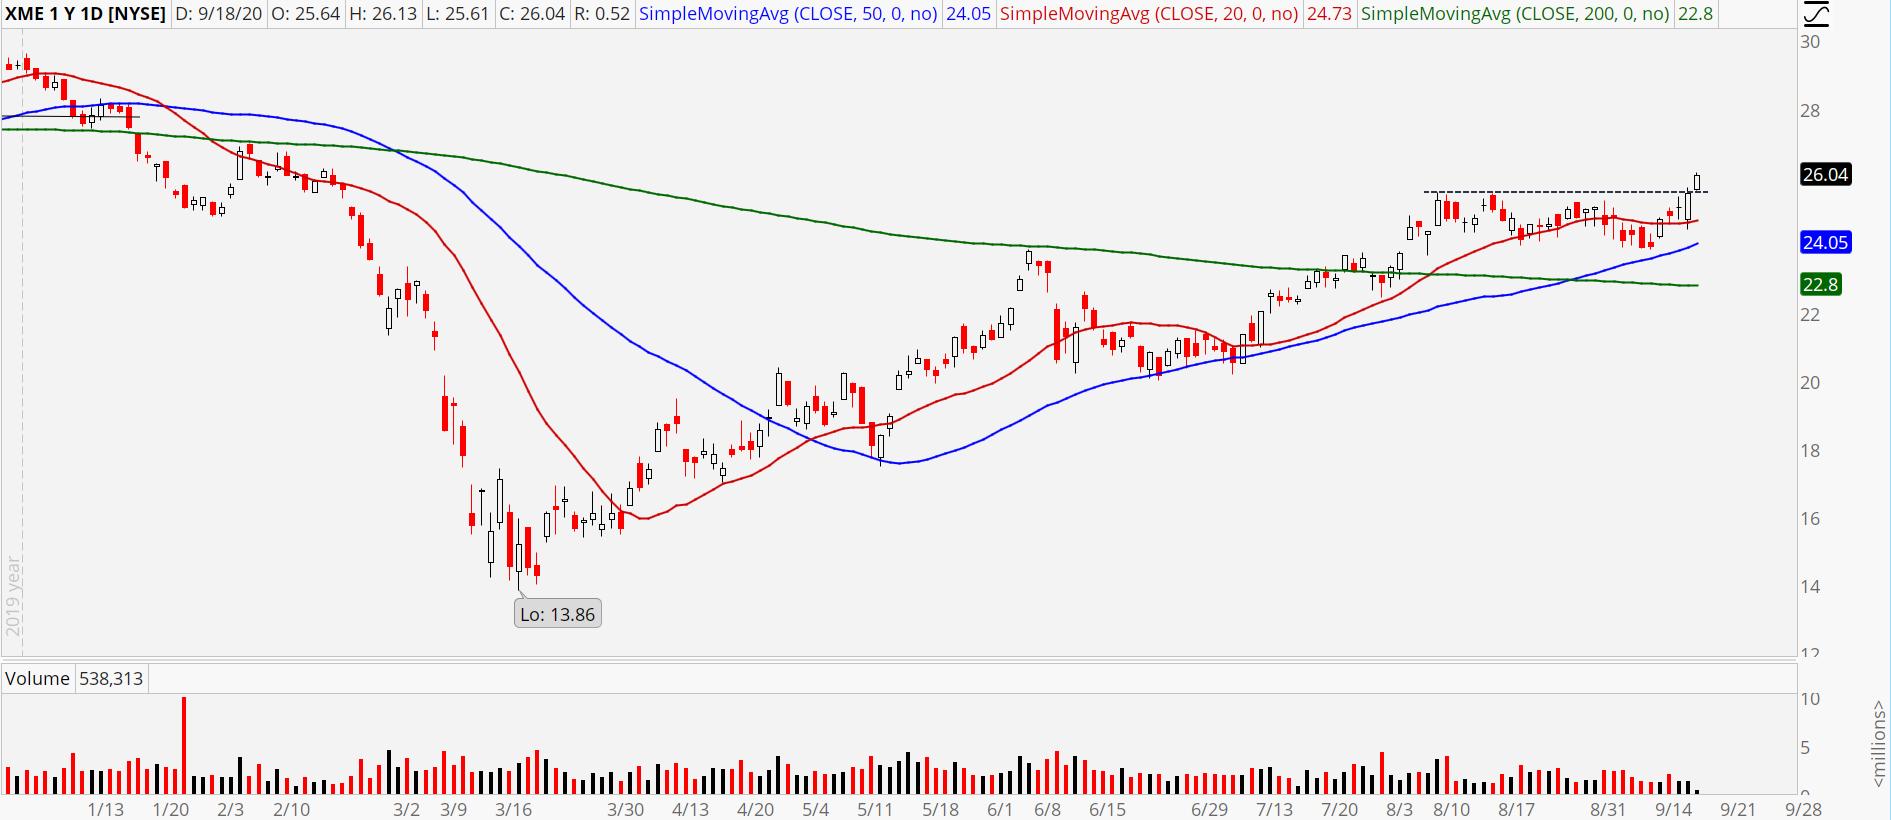 Metal & Mining ETF (XME) showing recent breakout